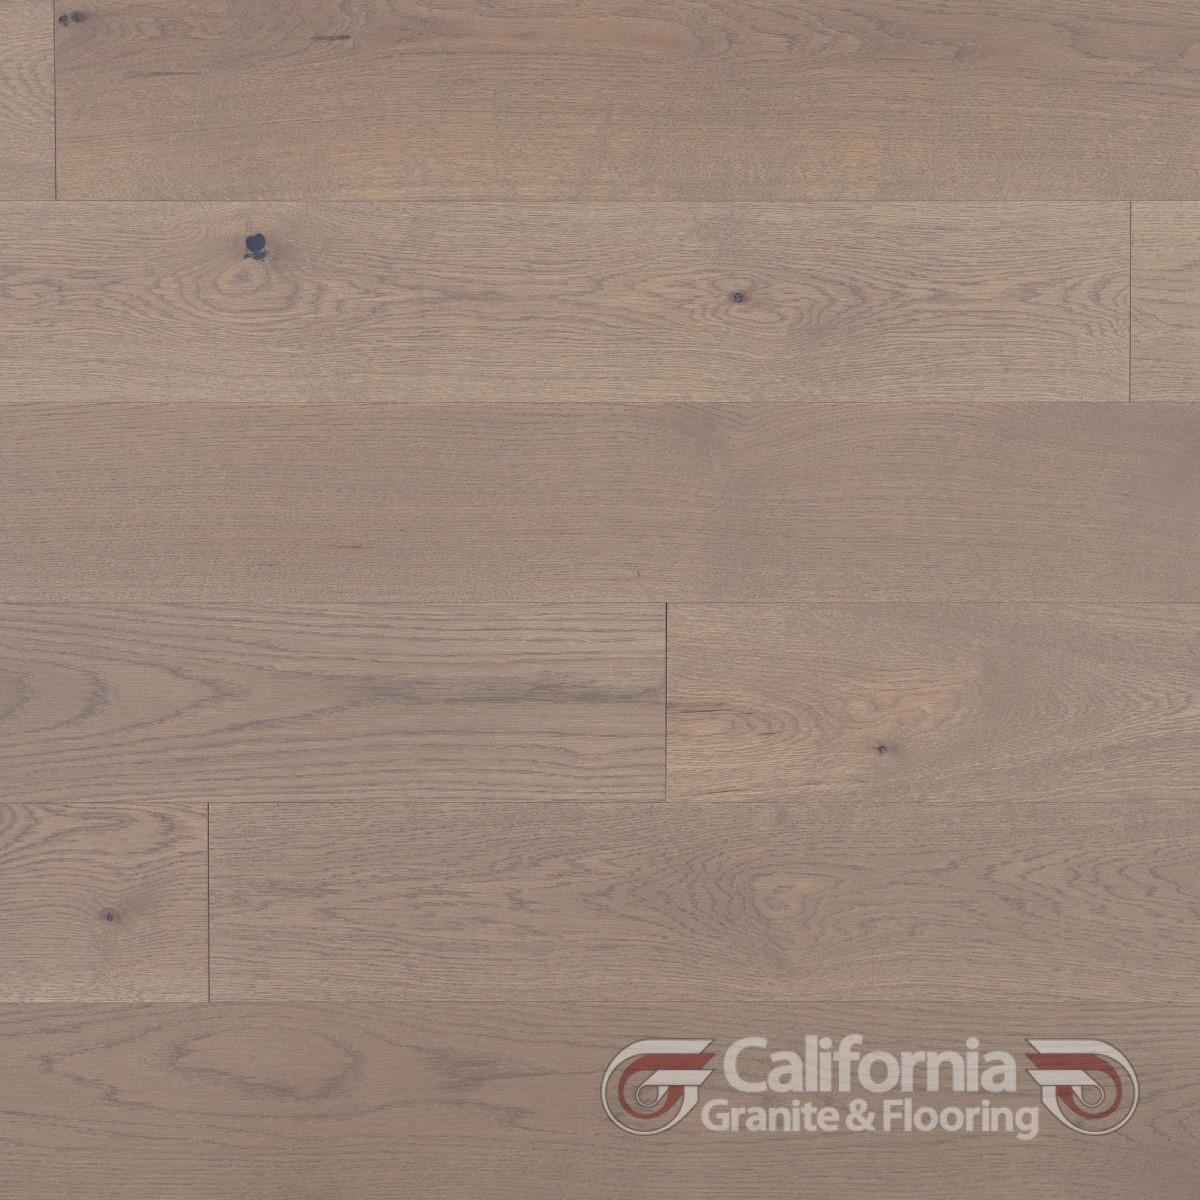 hardwood-flooring-white-oak-sand-dune-character-brushed-2